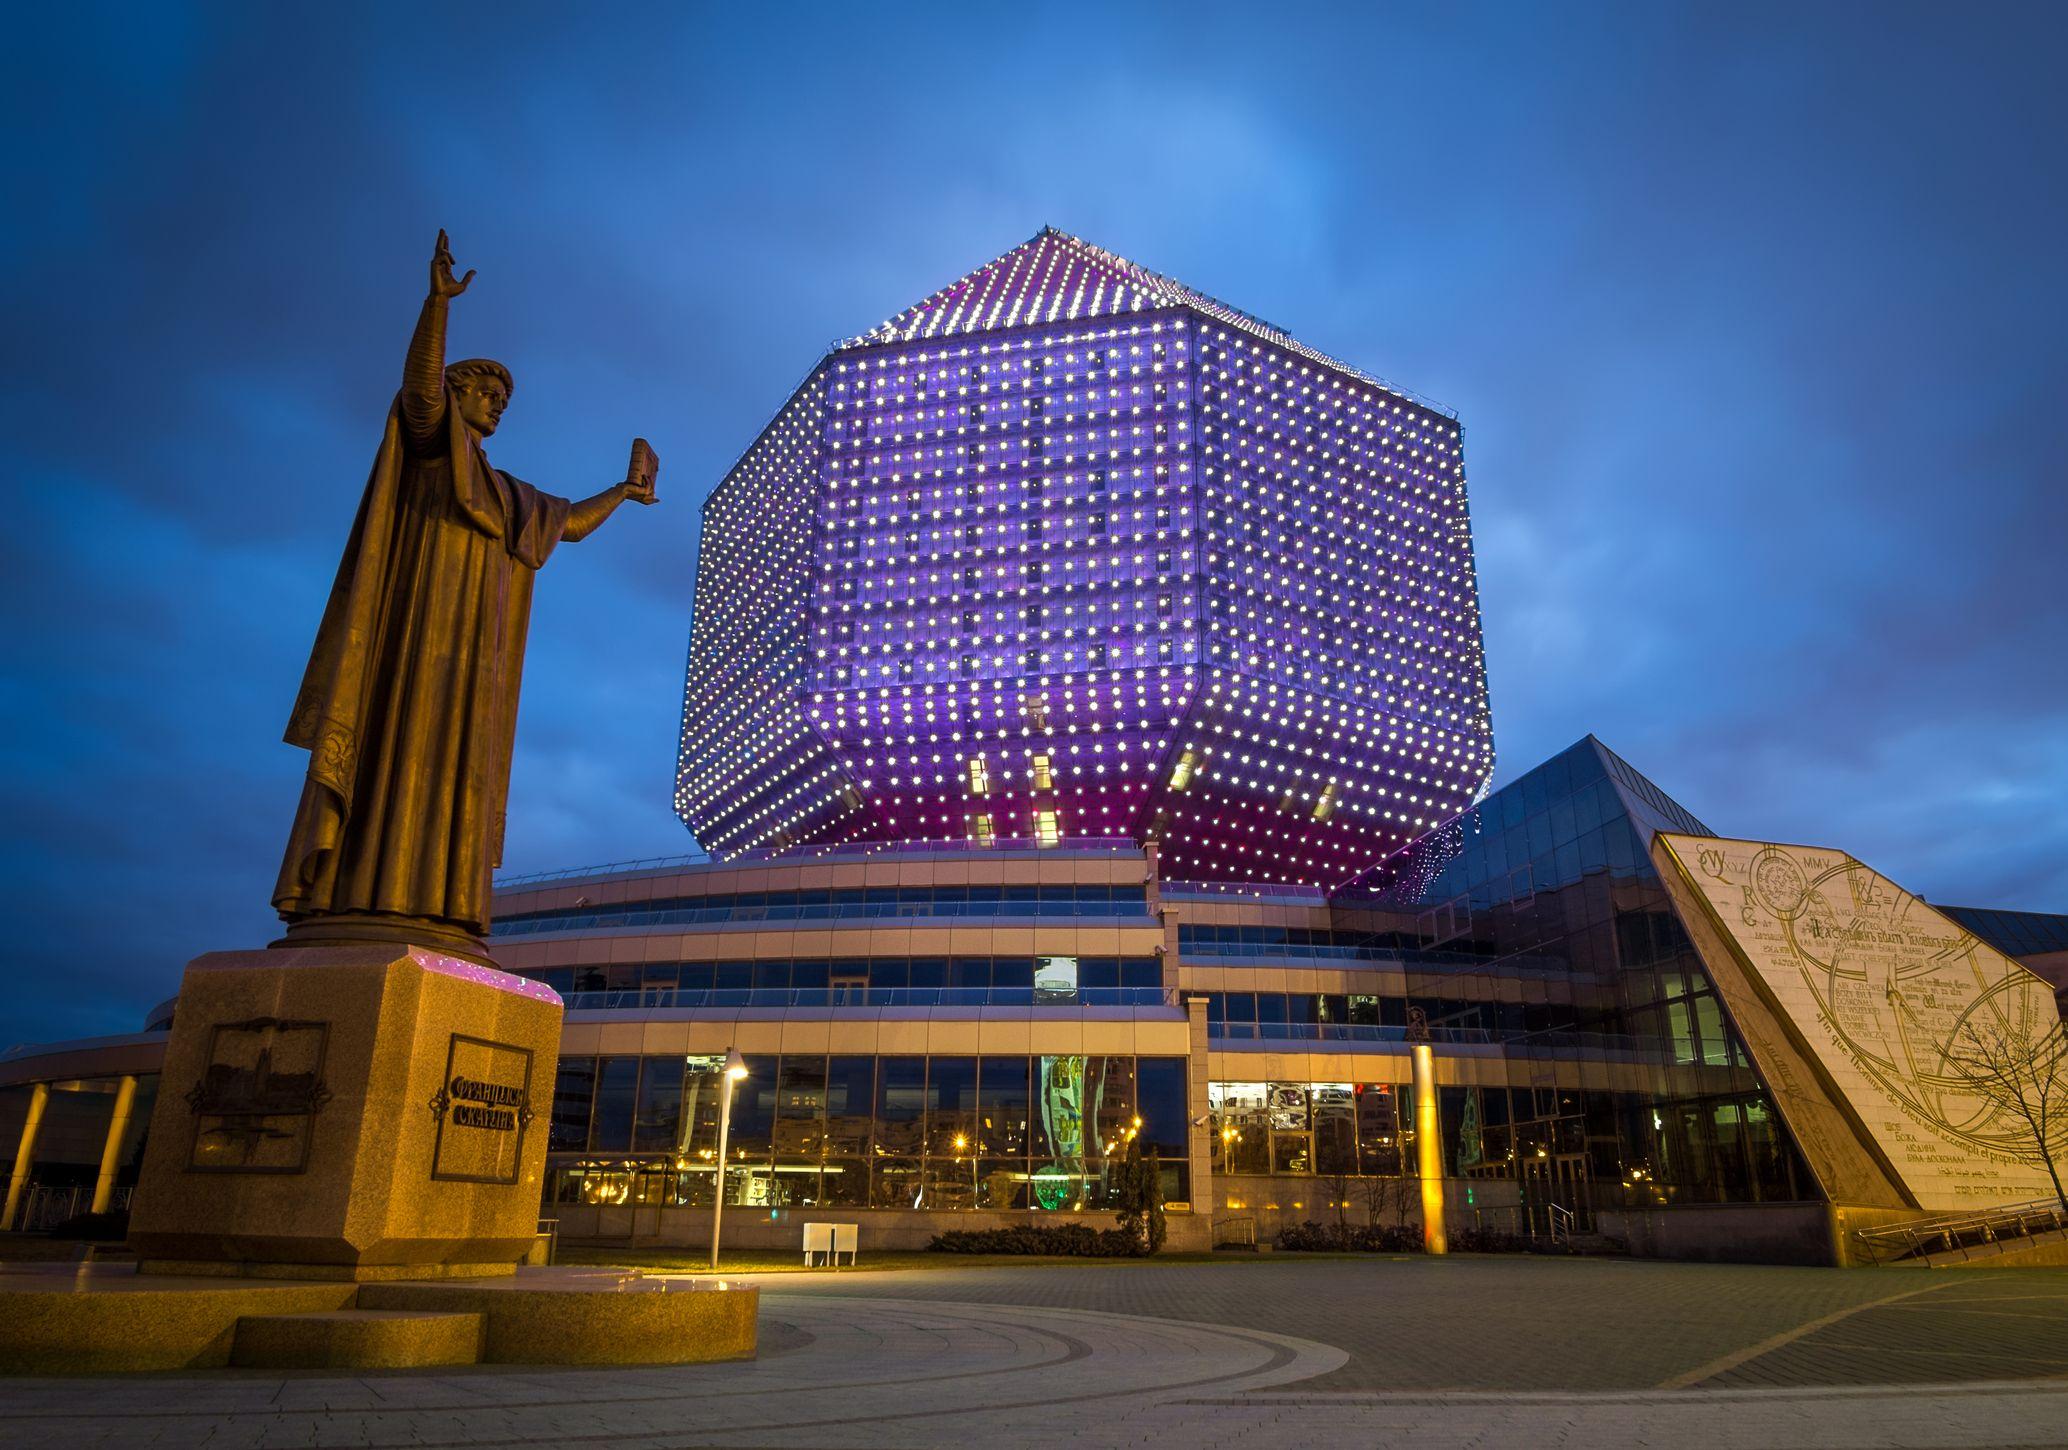 minsk-biblioteca-nacional-de-bielorussia-secret-world